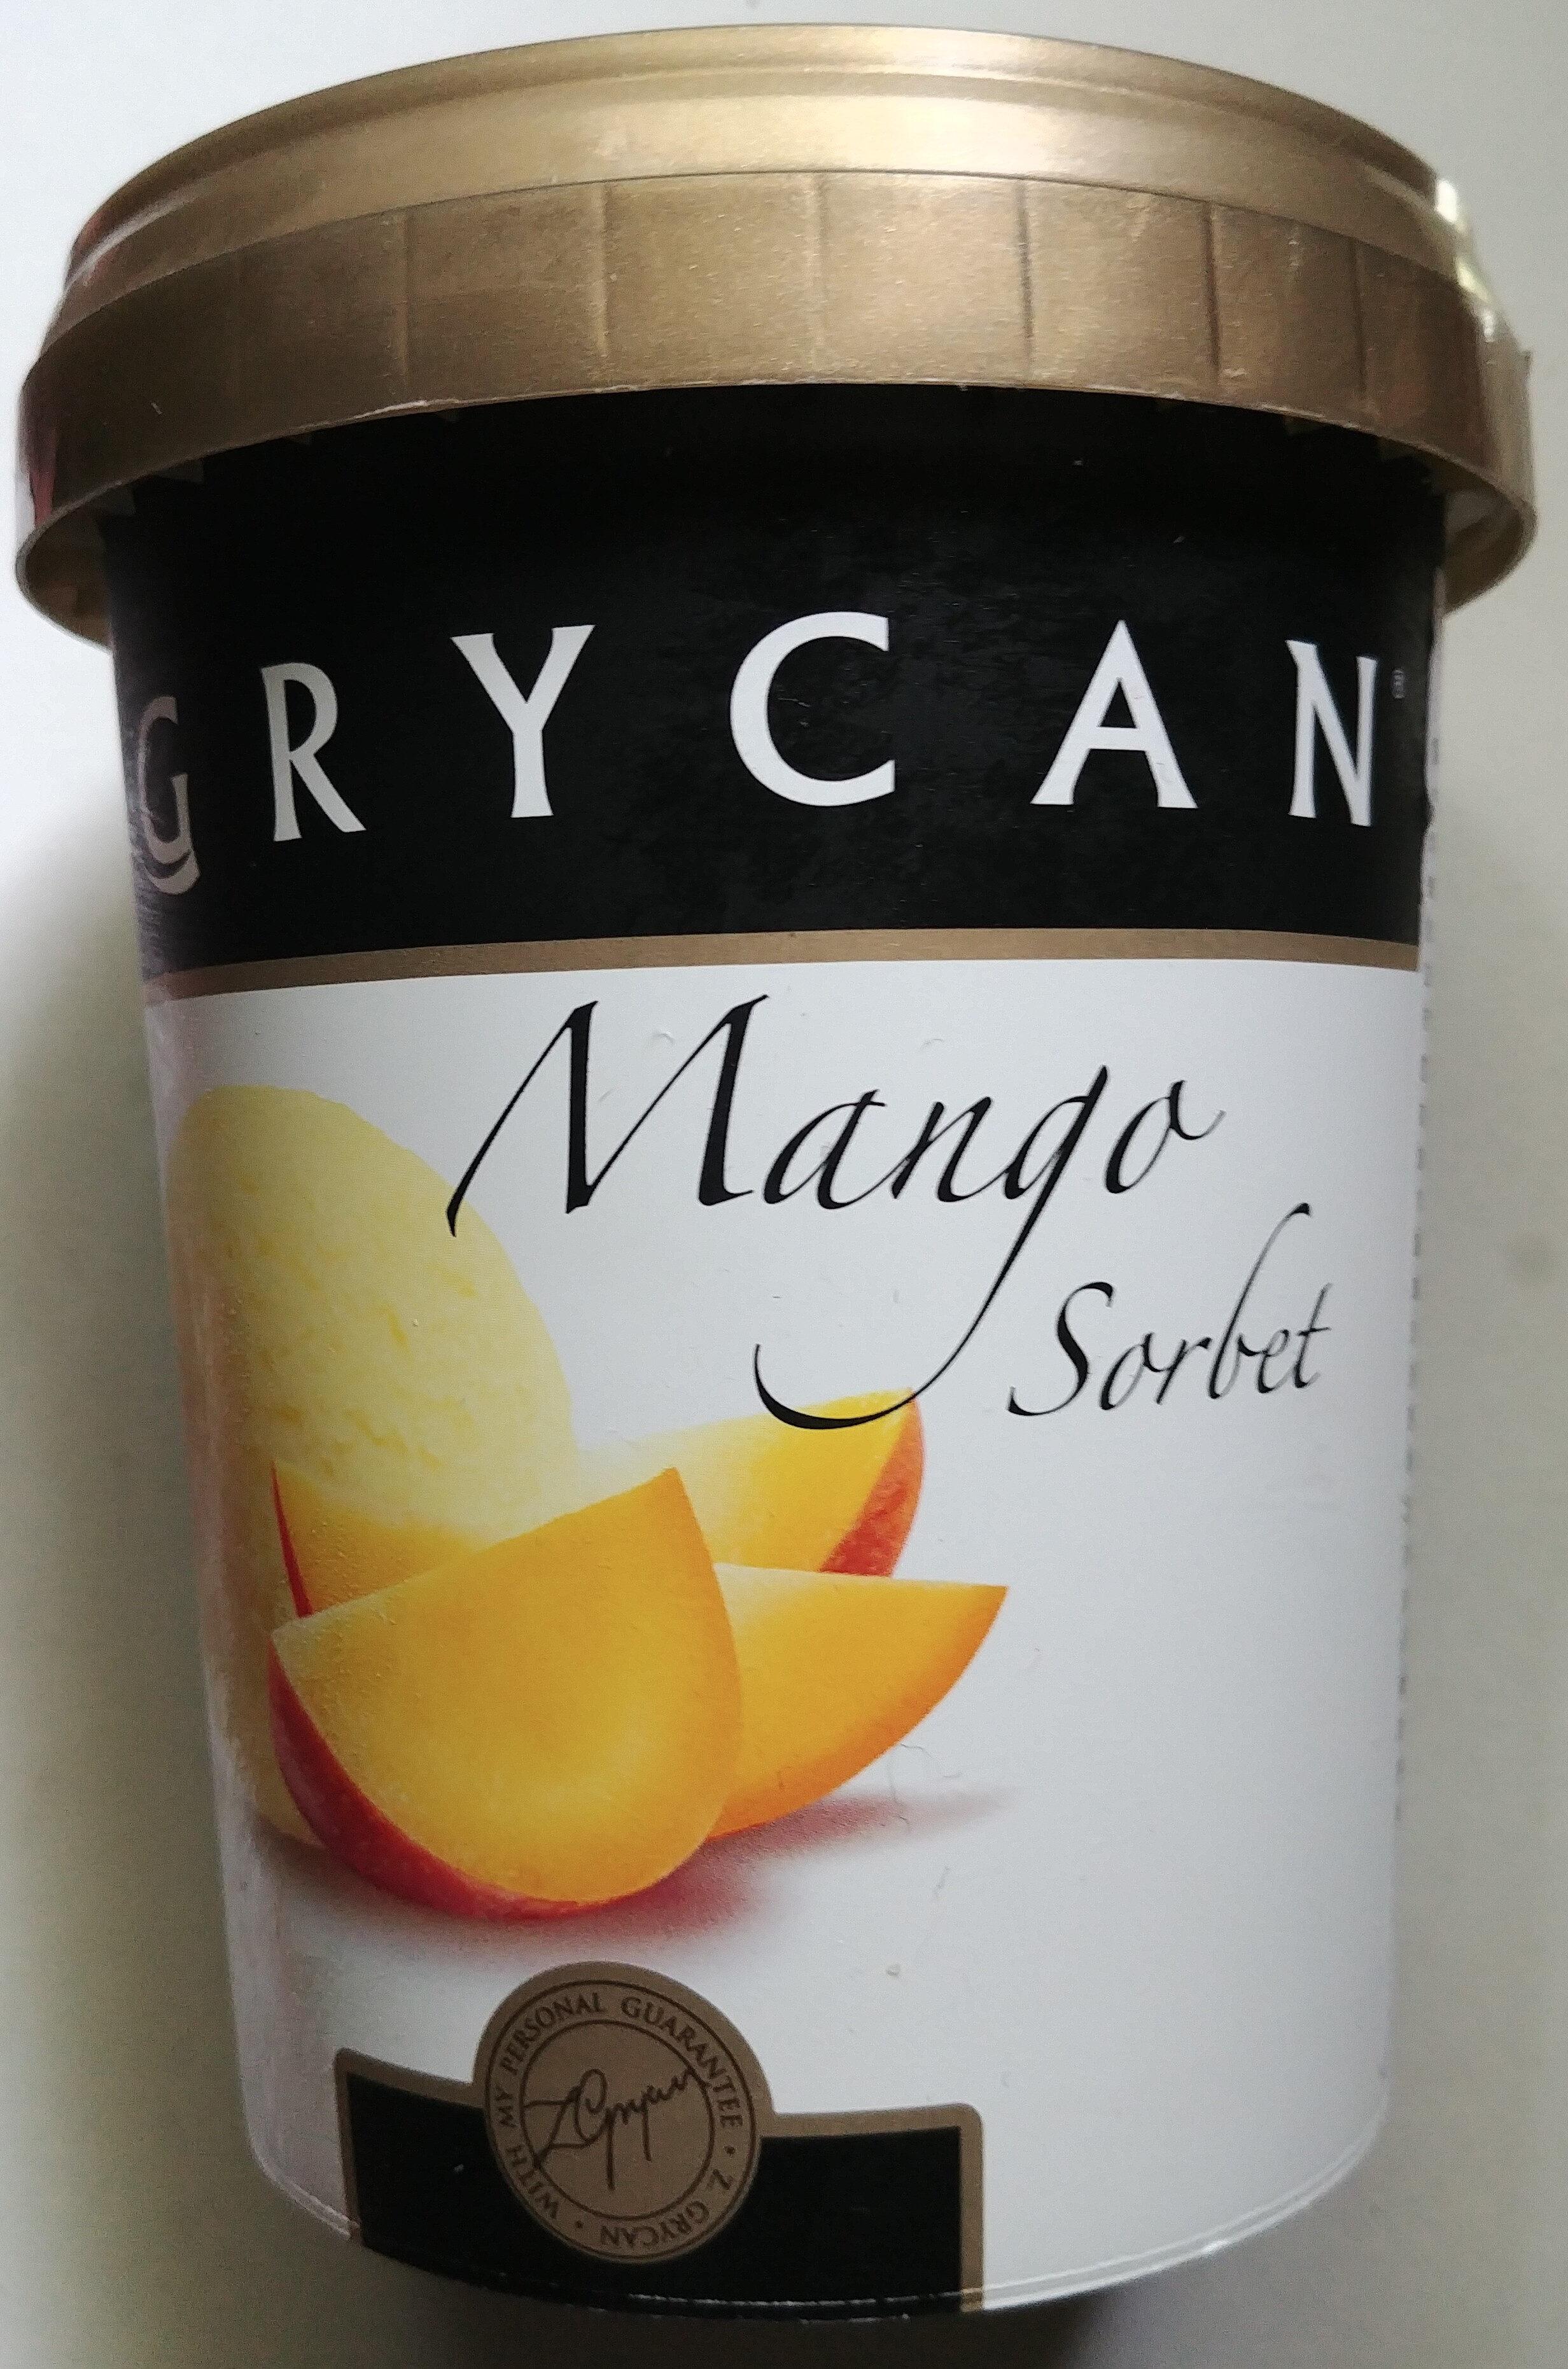 Mango Sorbet - Product - en